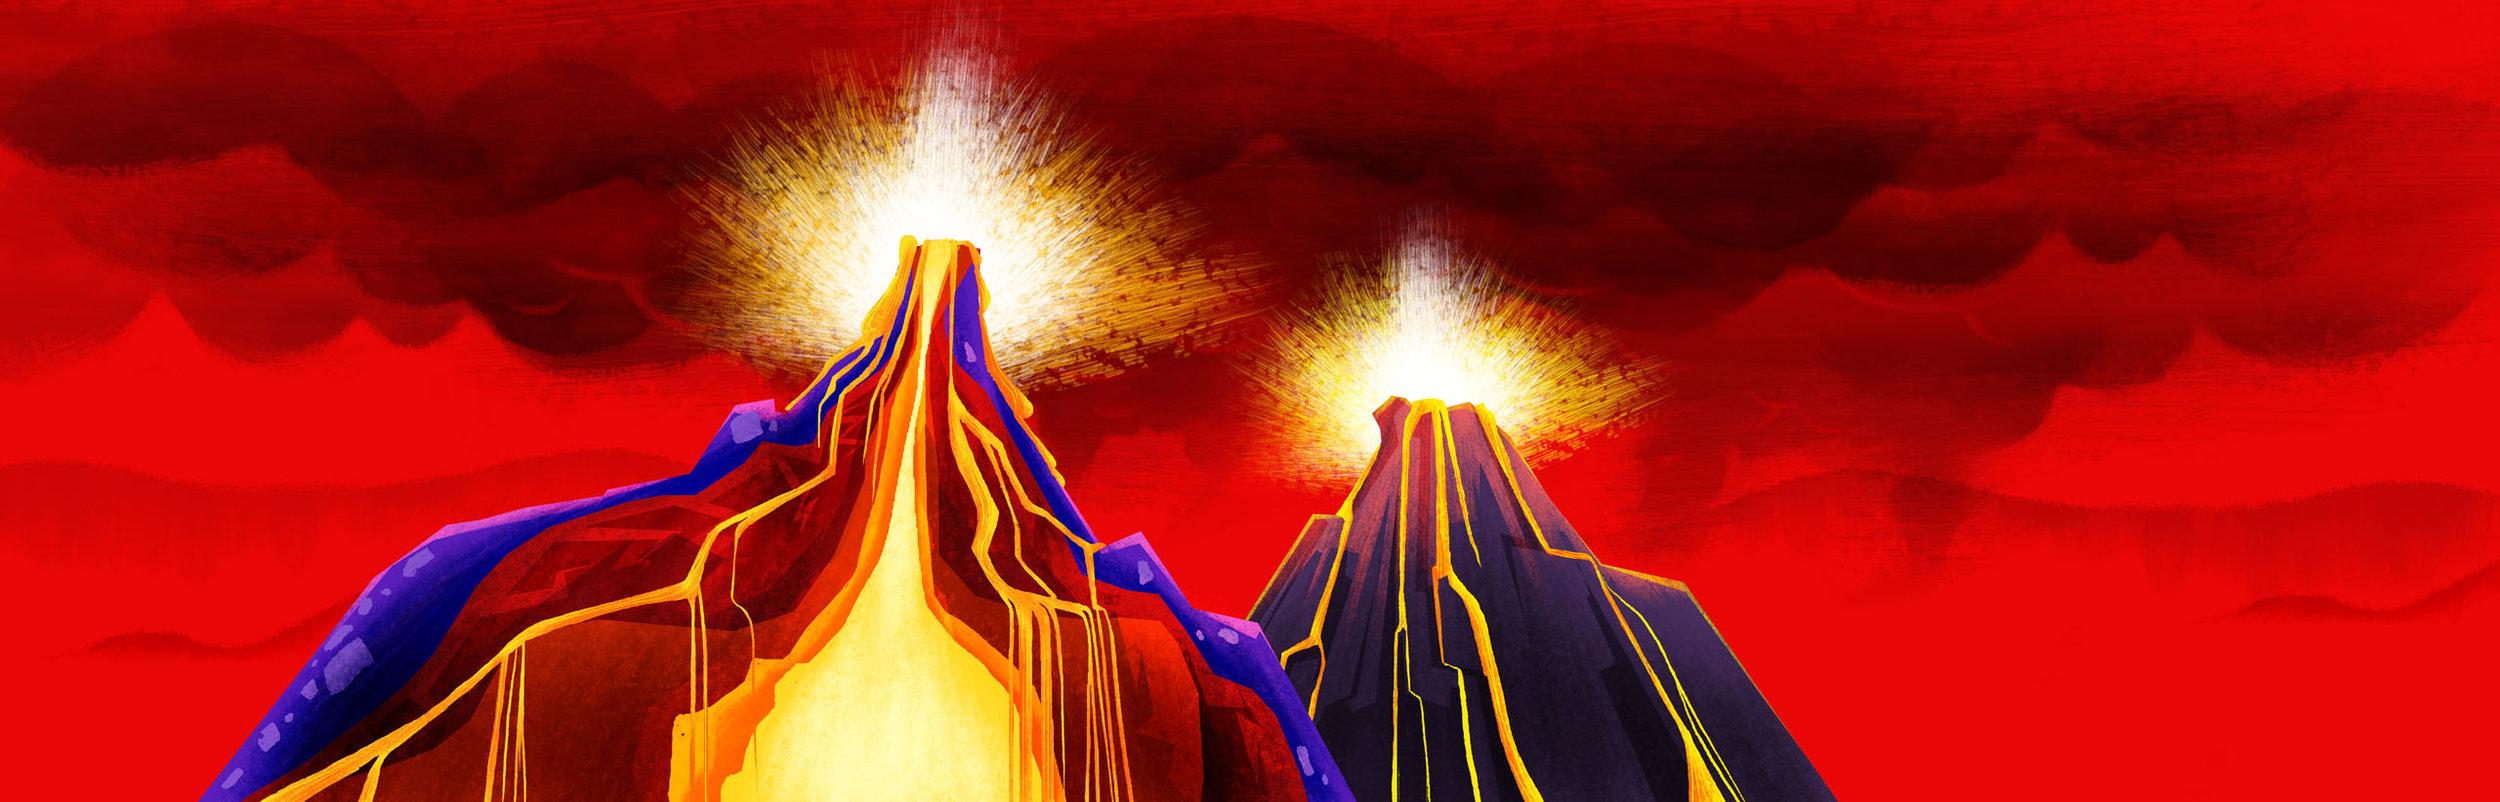 CWE_SC07_Earth_Plates_NEW volcanos_Streams-01.jpg